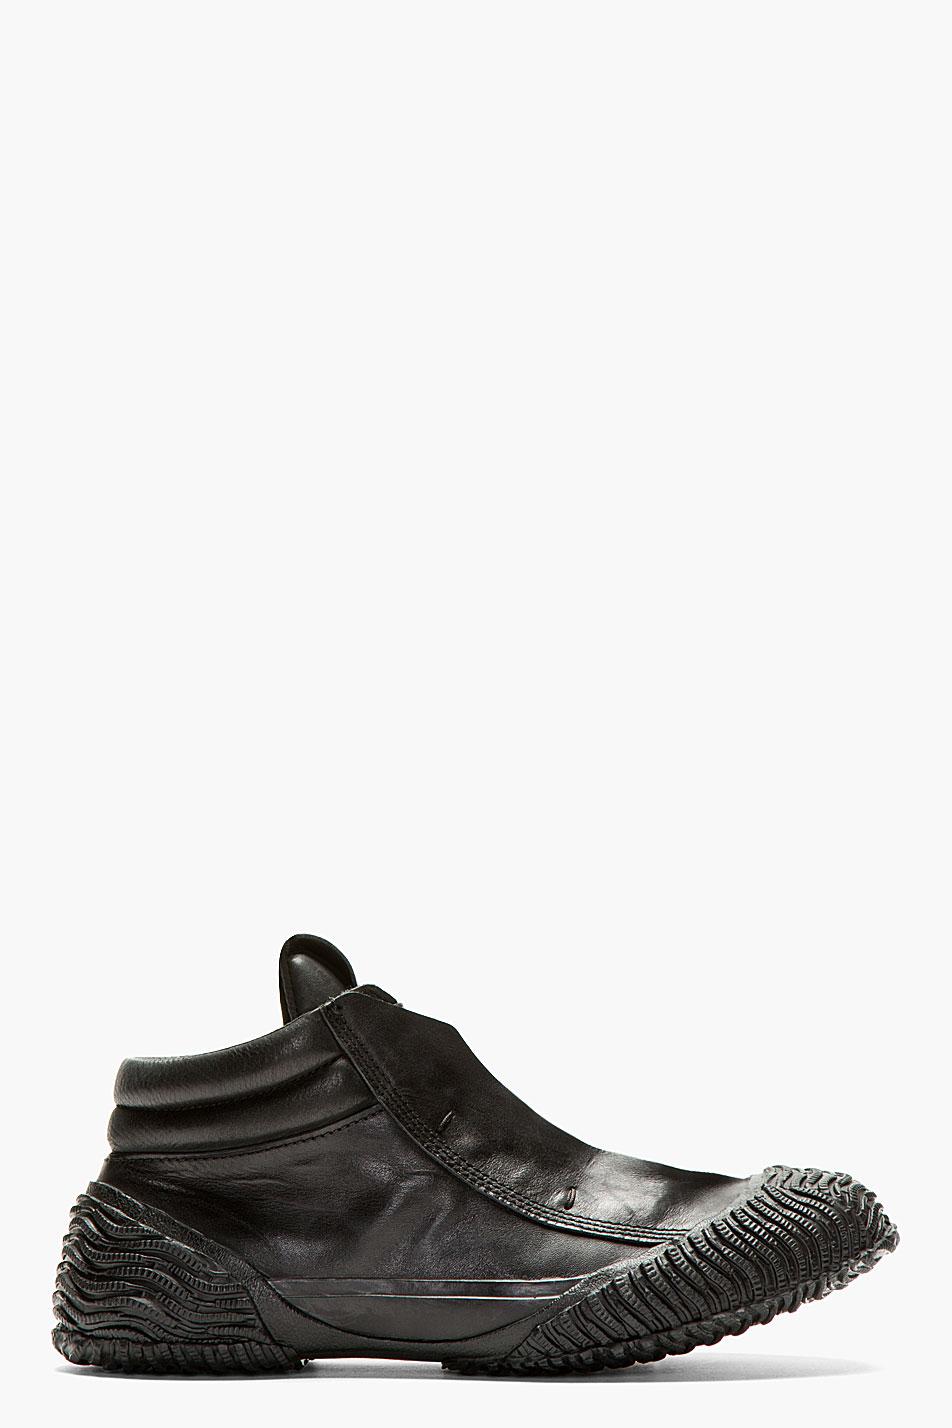 ma julius black leather wave tread sneakers